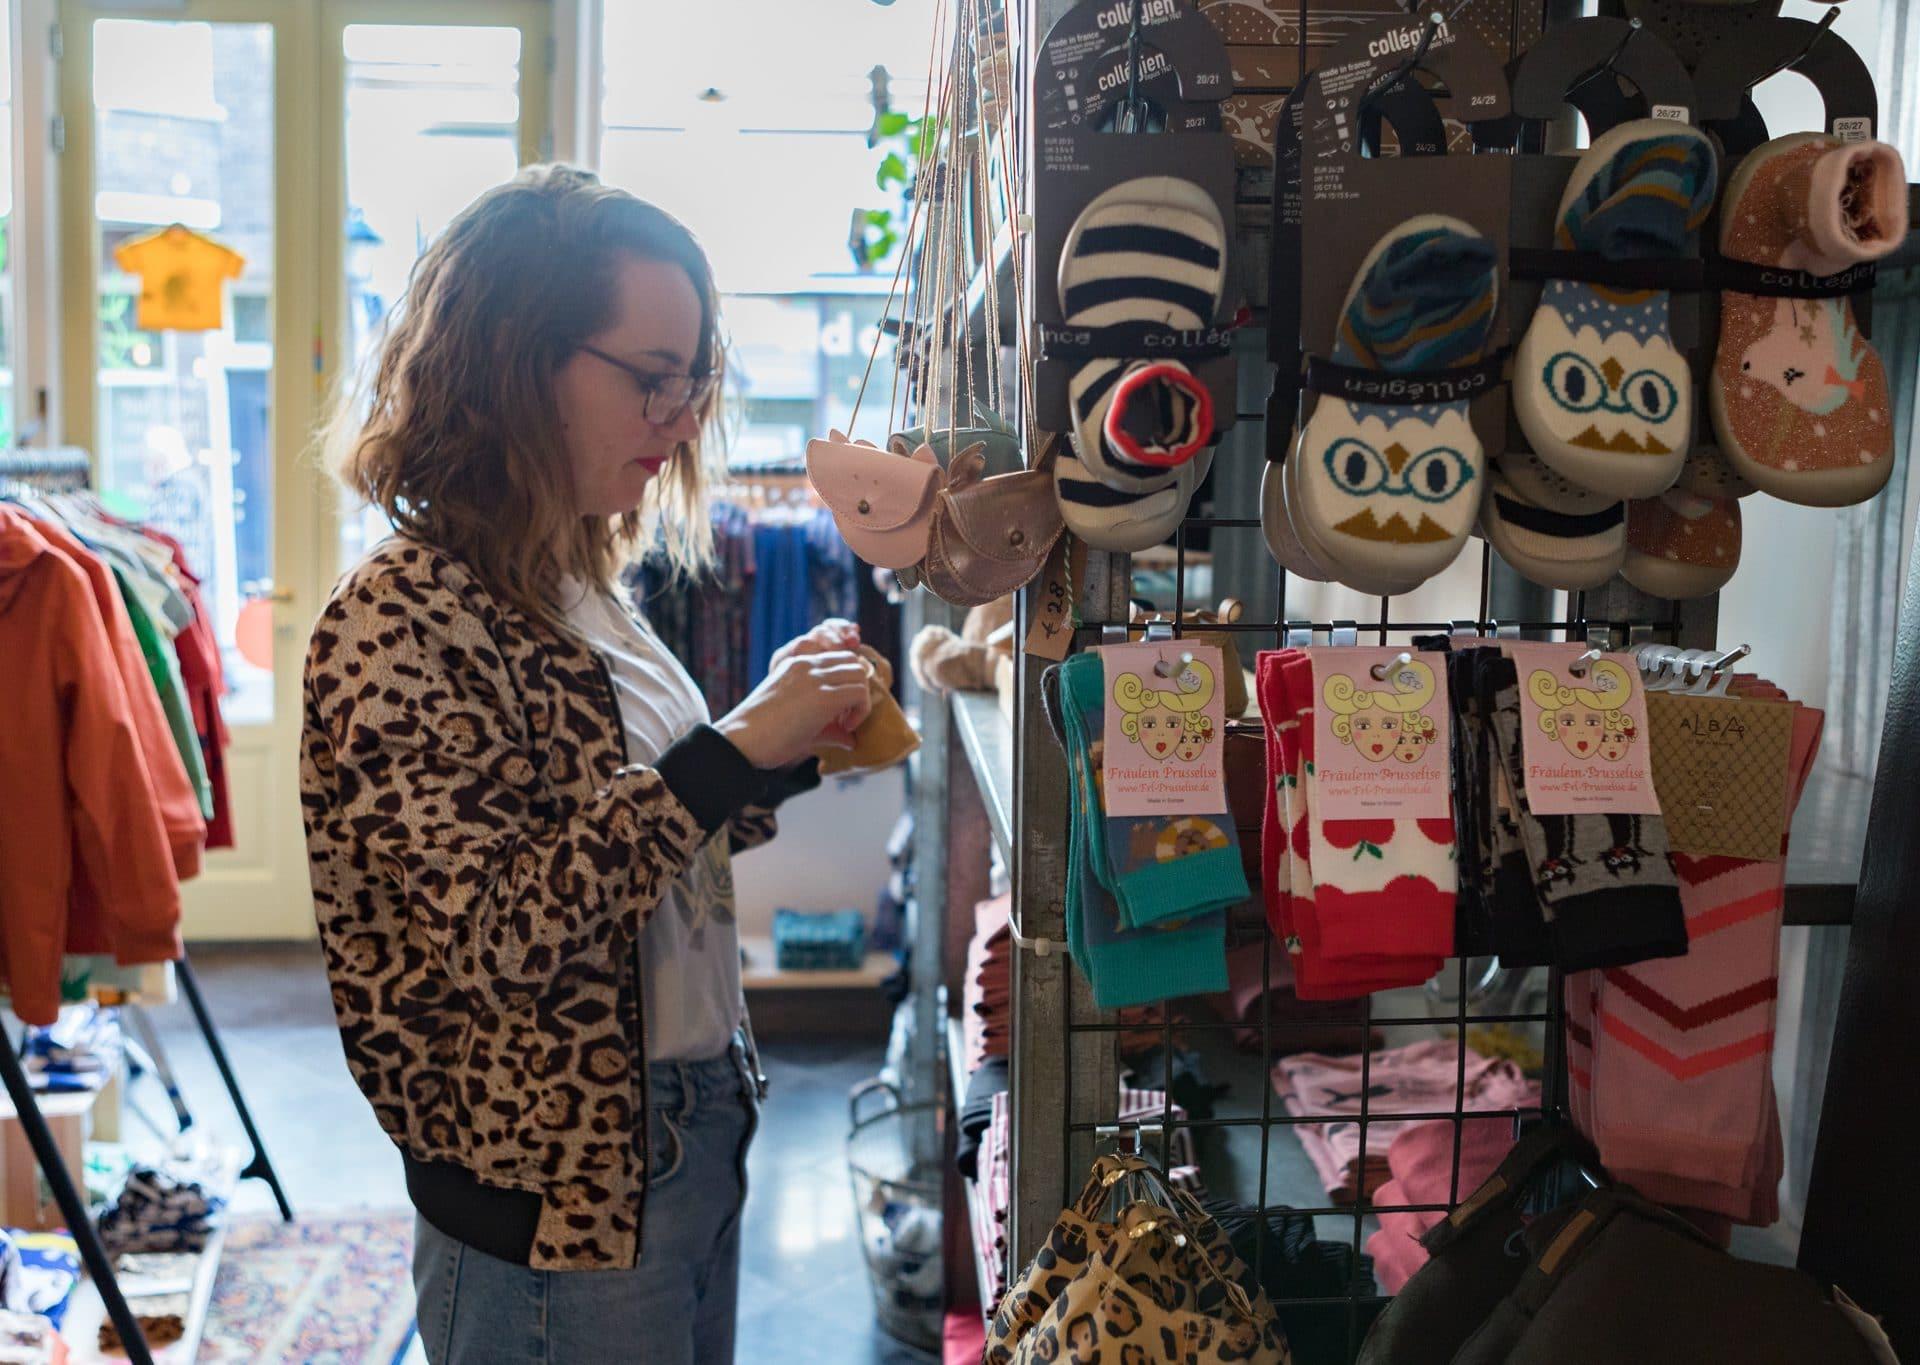 Kind Zo Blij - Dordrecht - Voorstraat - kinderkleding - babykleding - speelgoed